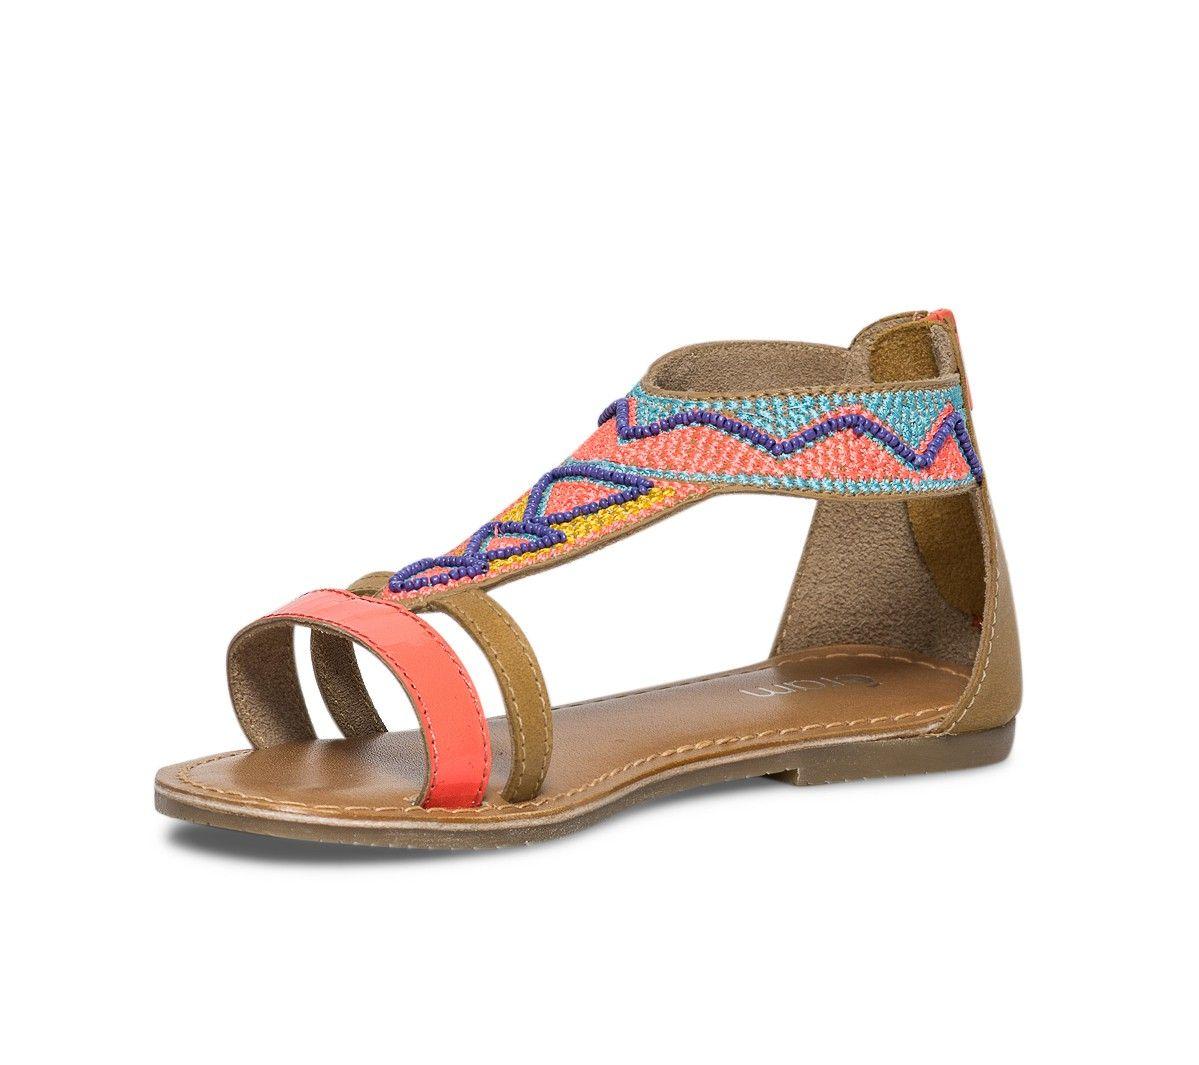 tout neuf 65429 84cc6 Sandale cuir brodée multicolore - Chaussures fille ...